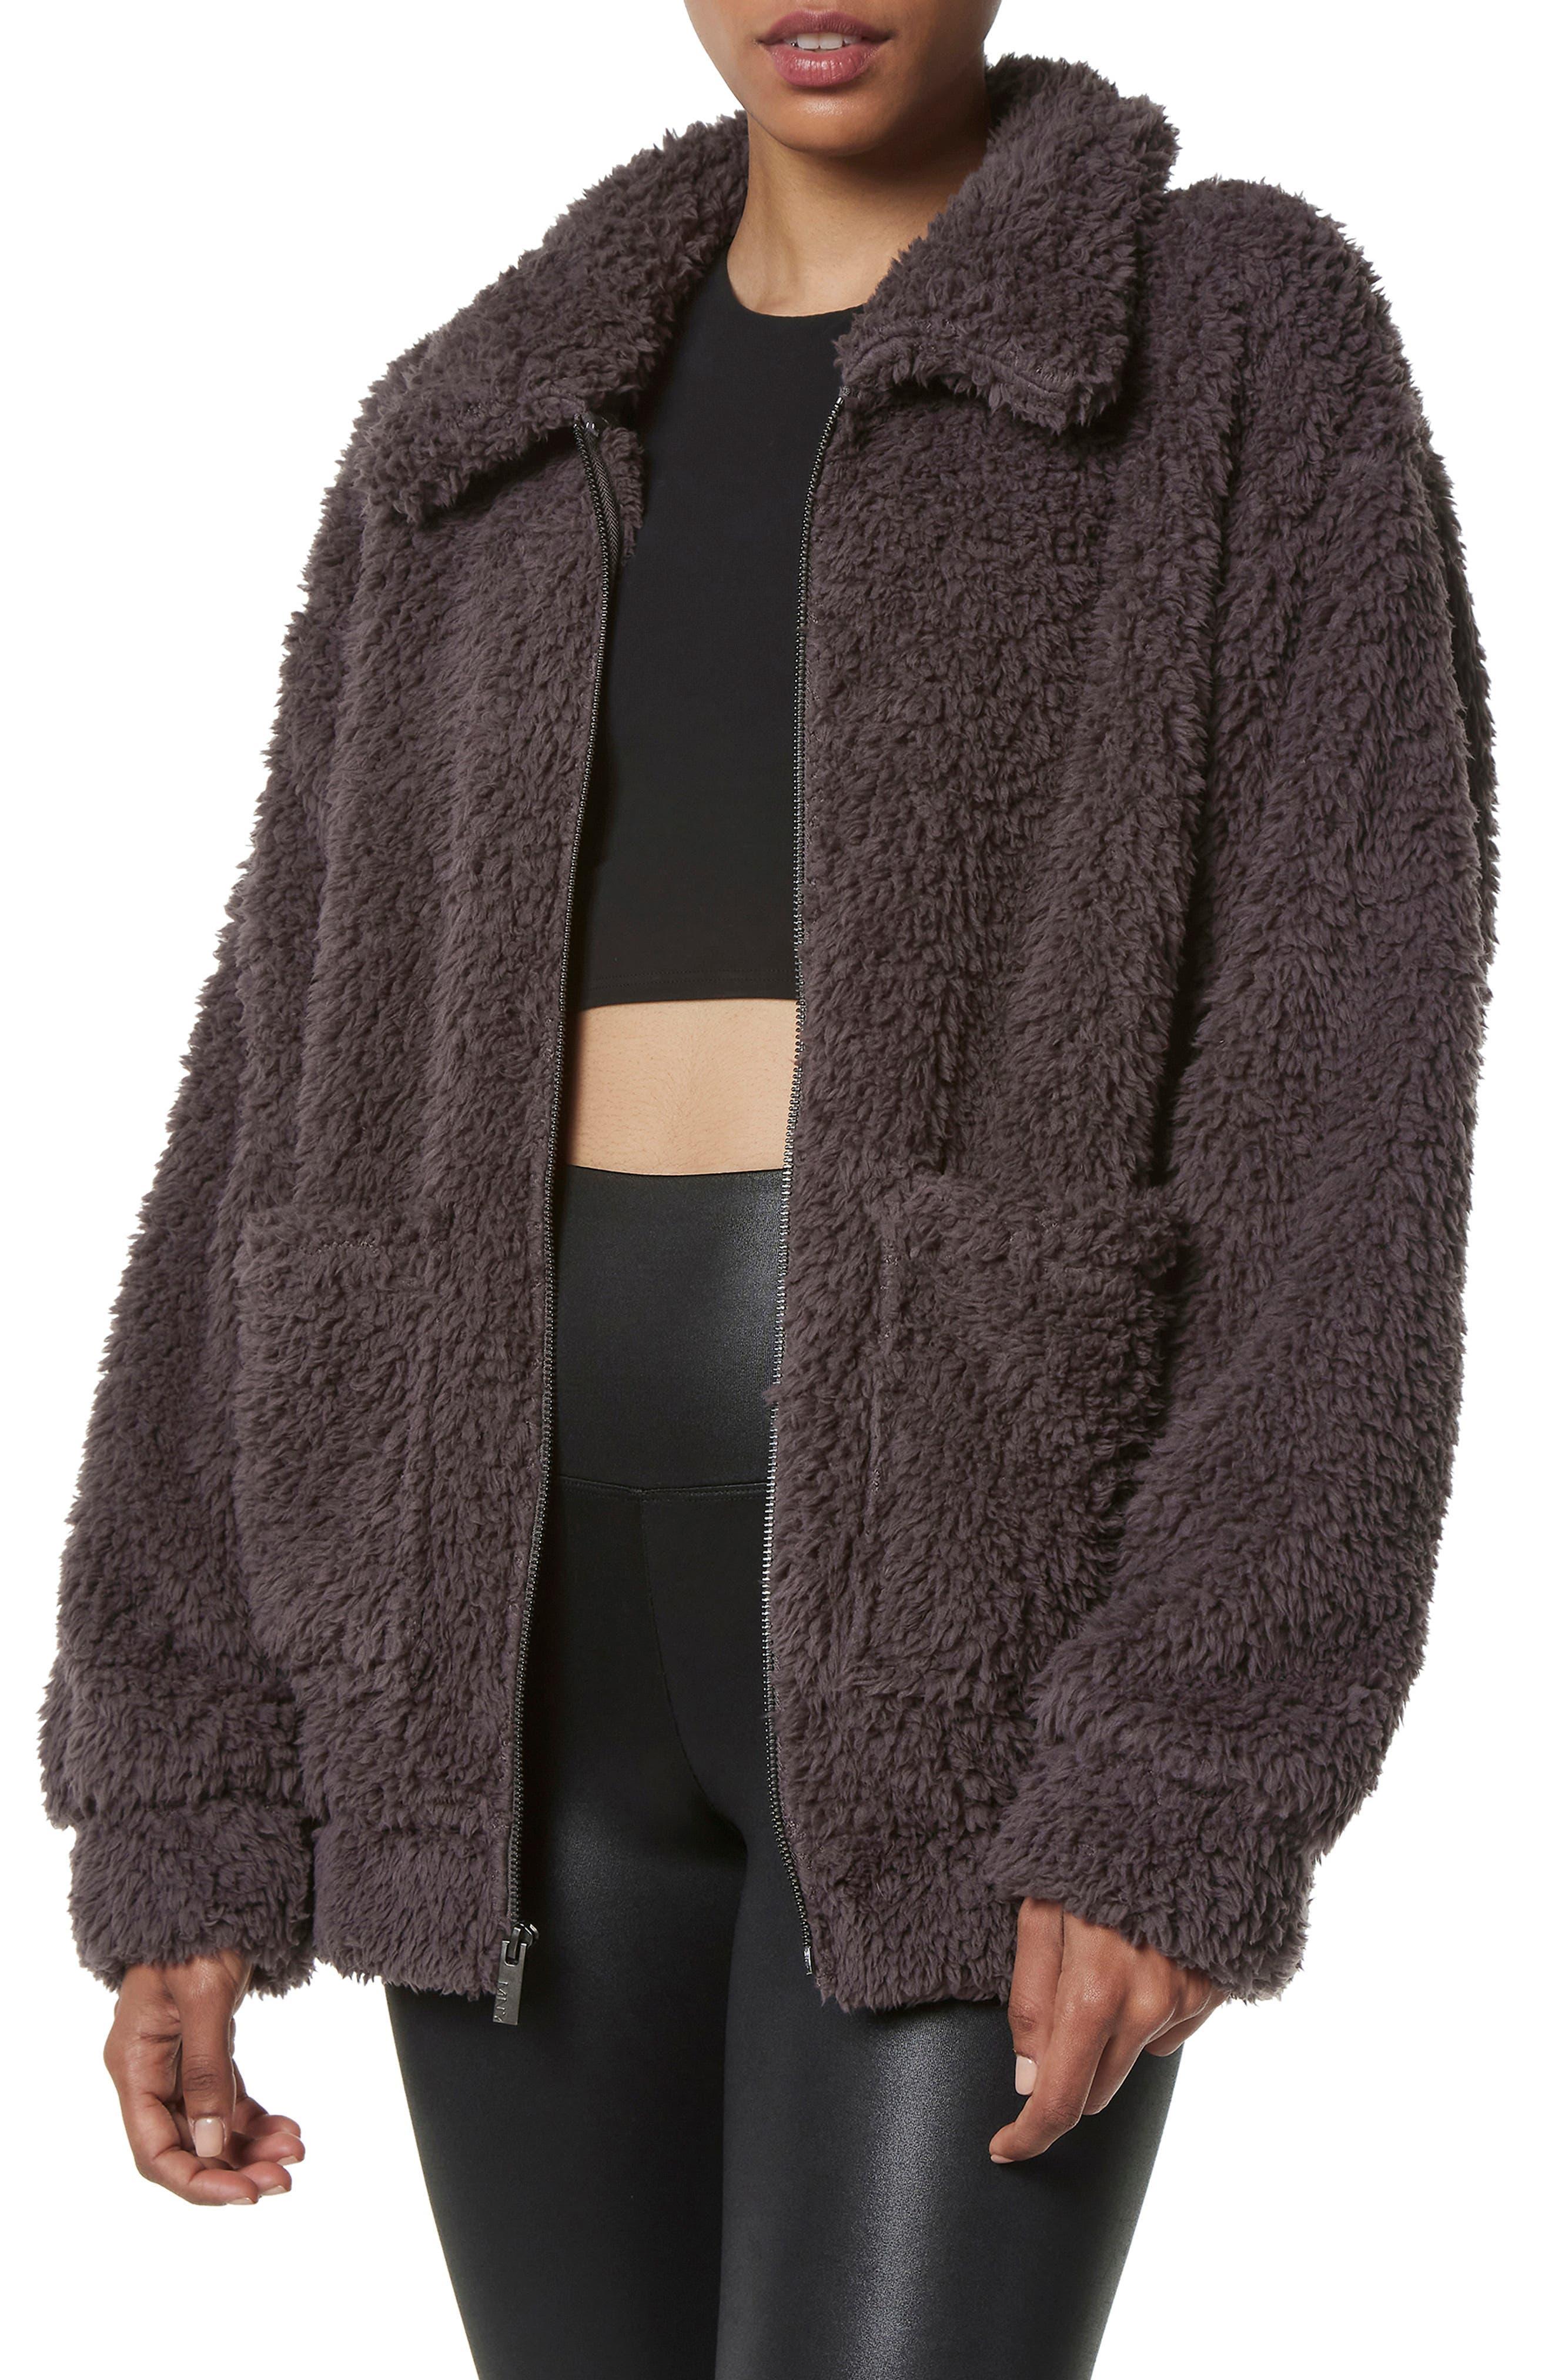 Ultra Soft Faux Fur Jacket